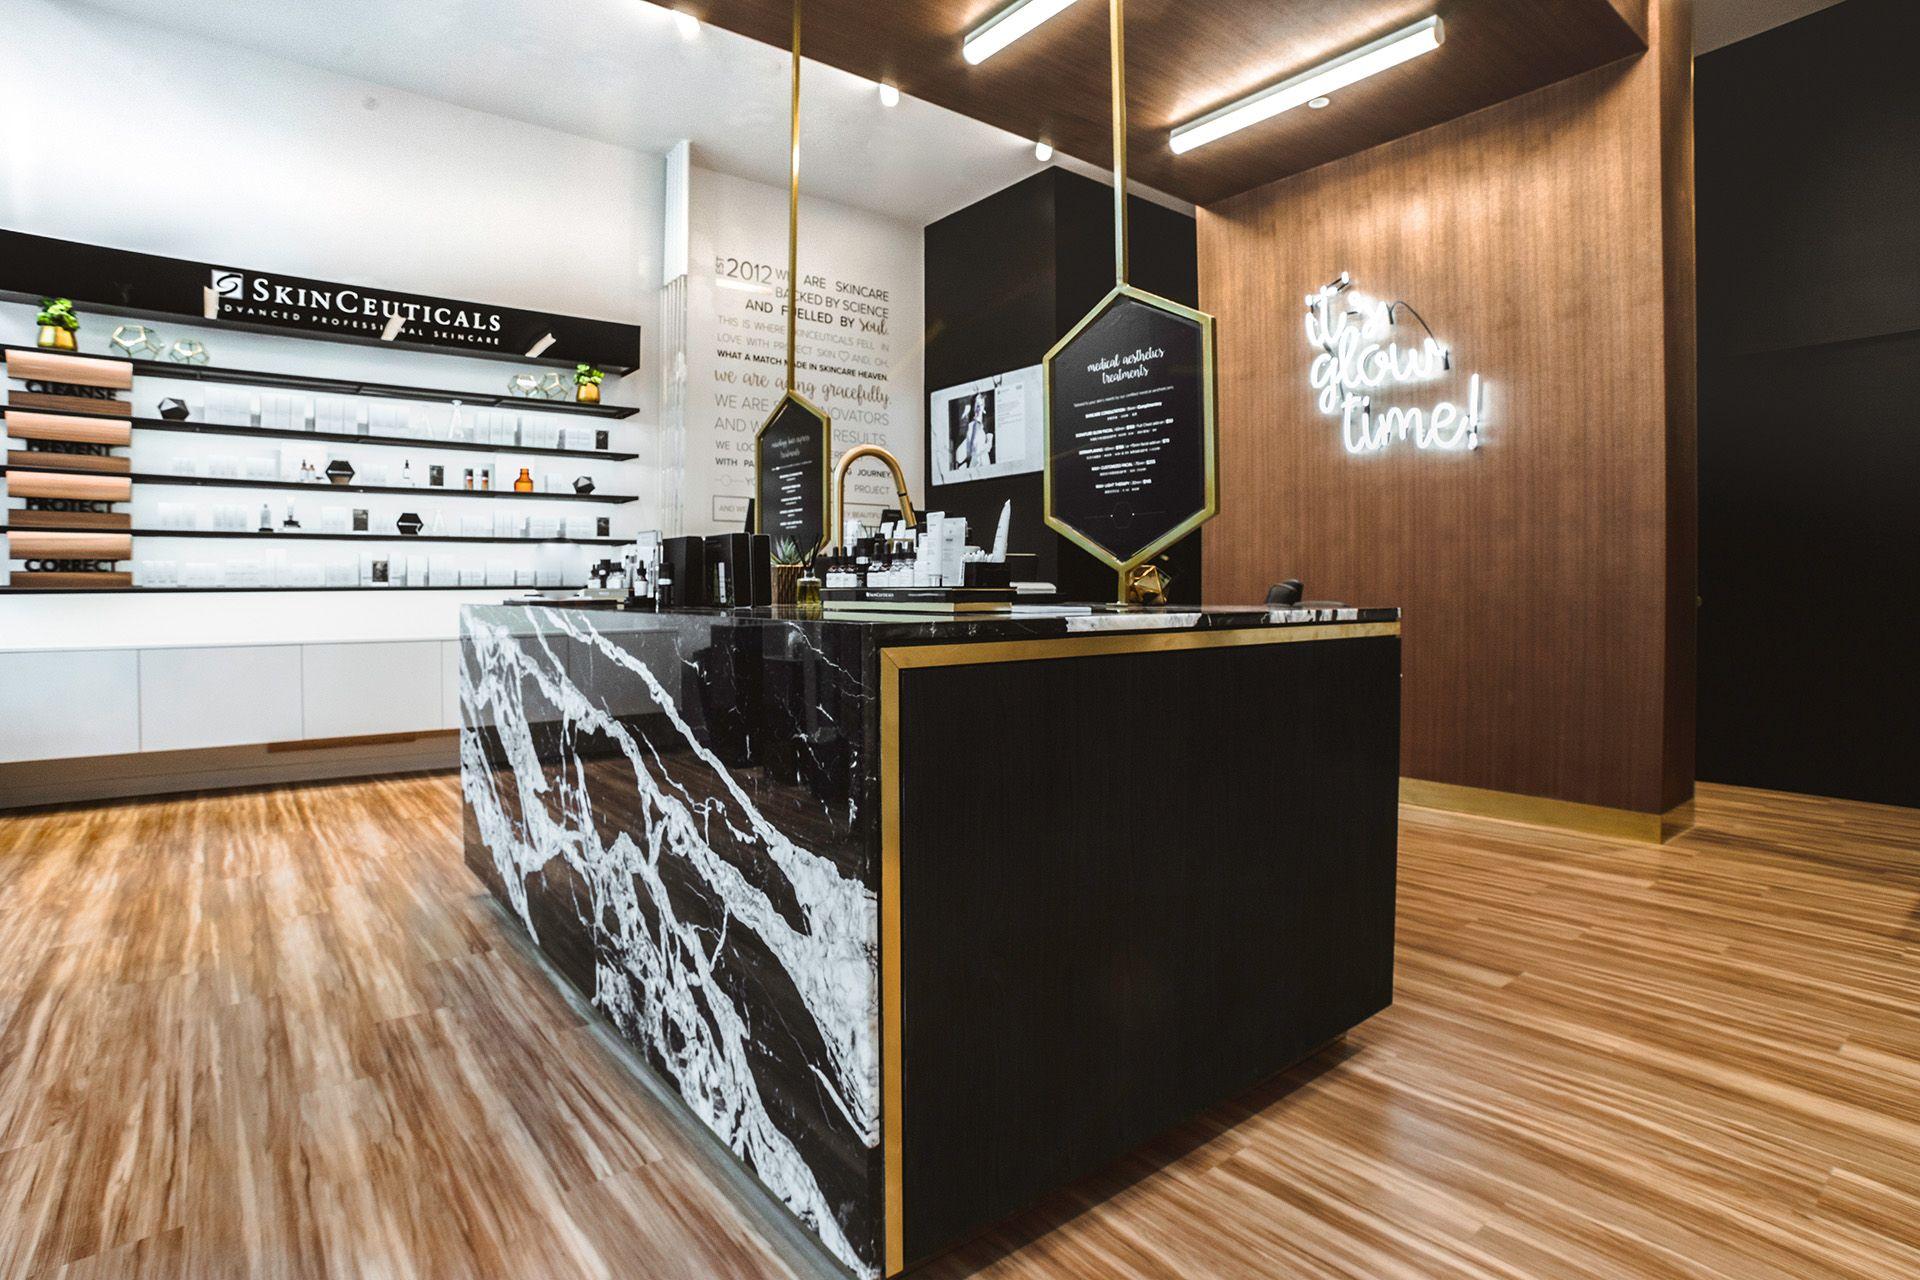 Richmond Bc Shop Skinceuticals By Project Skin Retail Interior